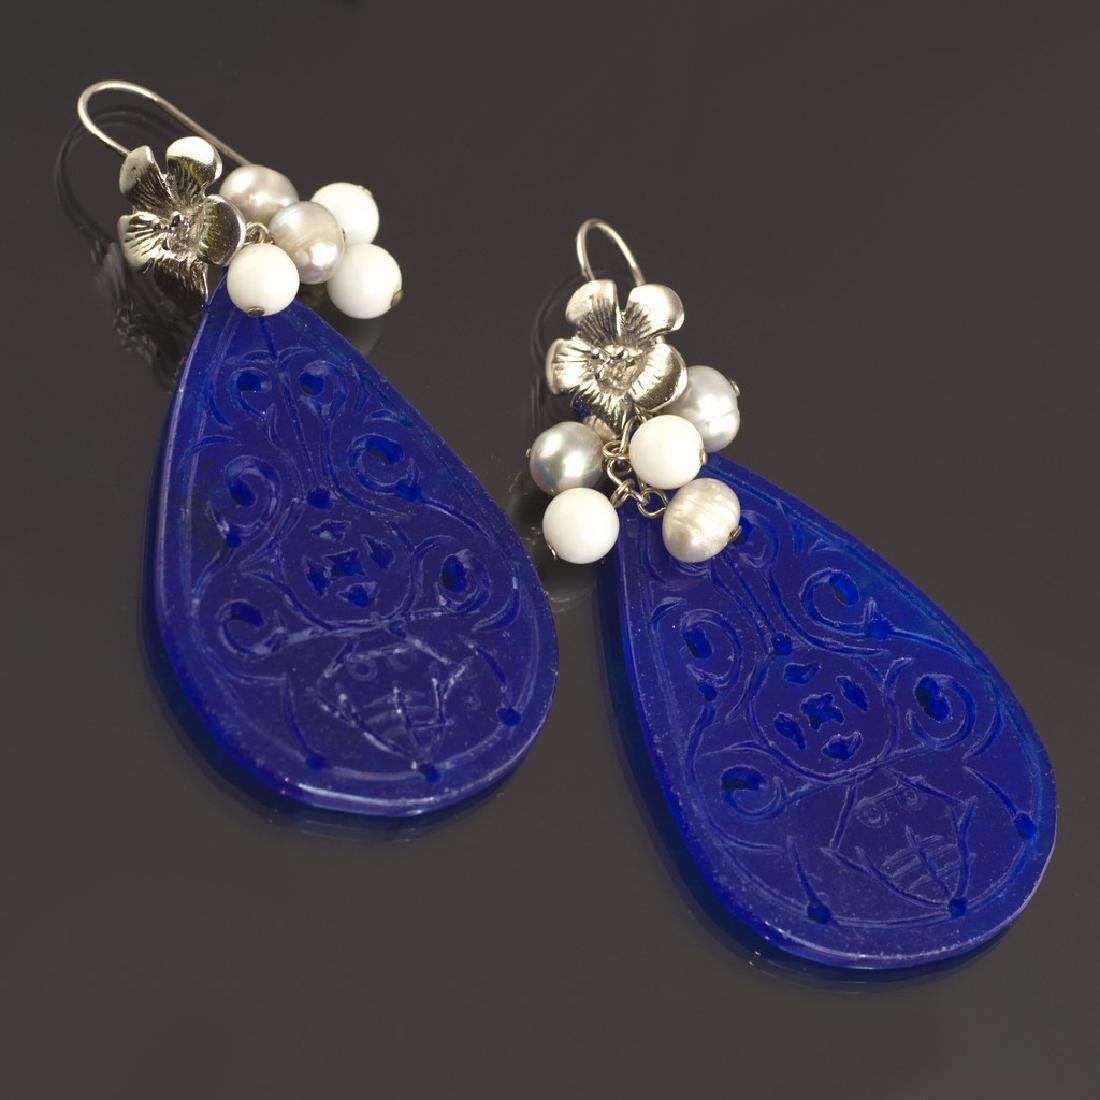 Blue Transparent Jade Earrings - 4